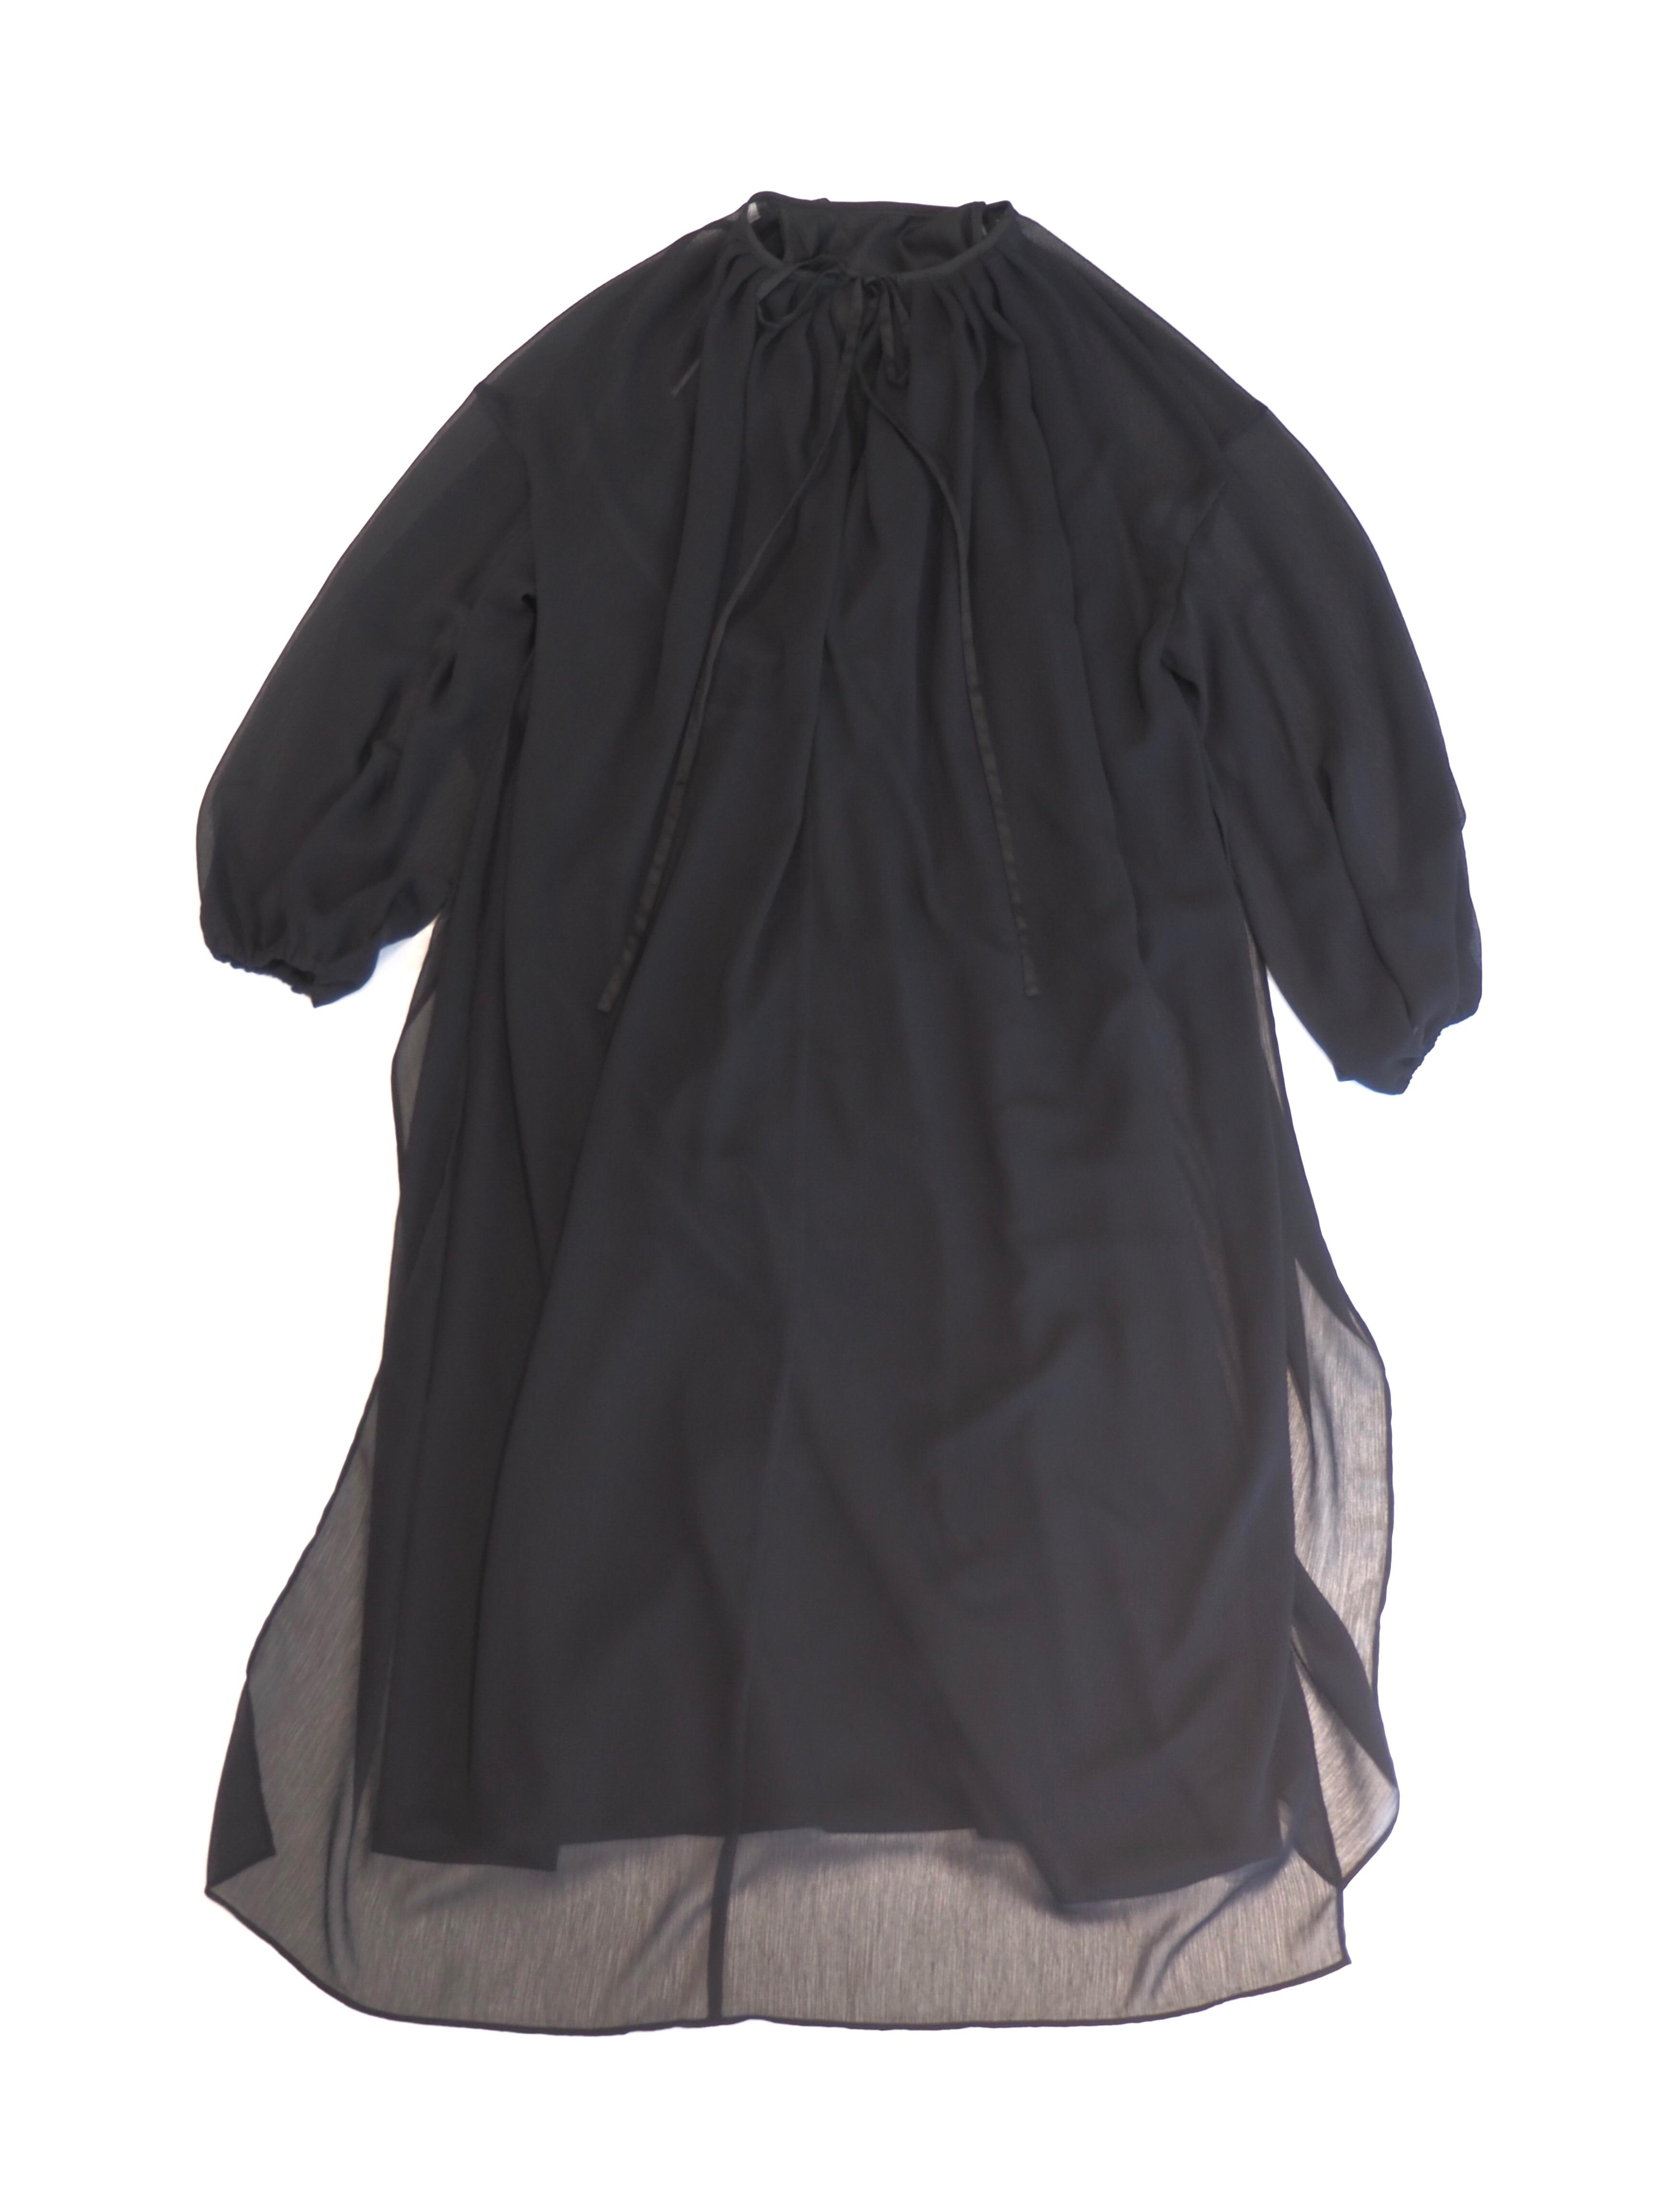 【ELIN】SHEER LAYERED DRESS